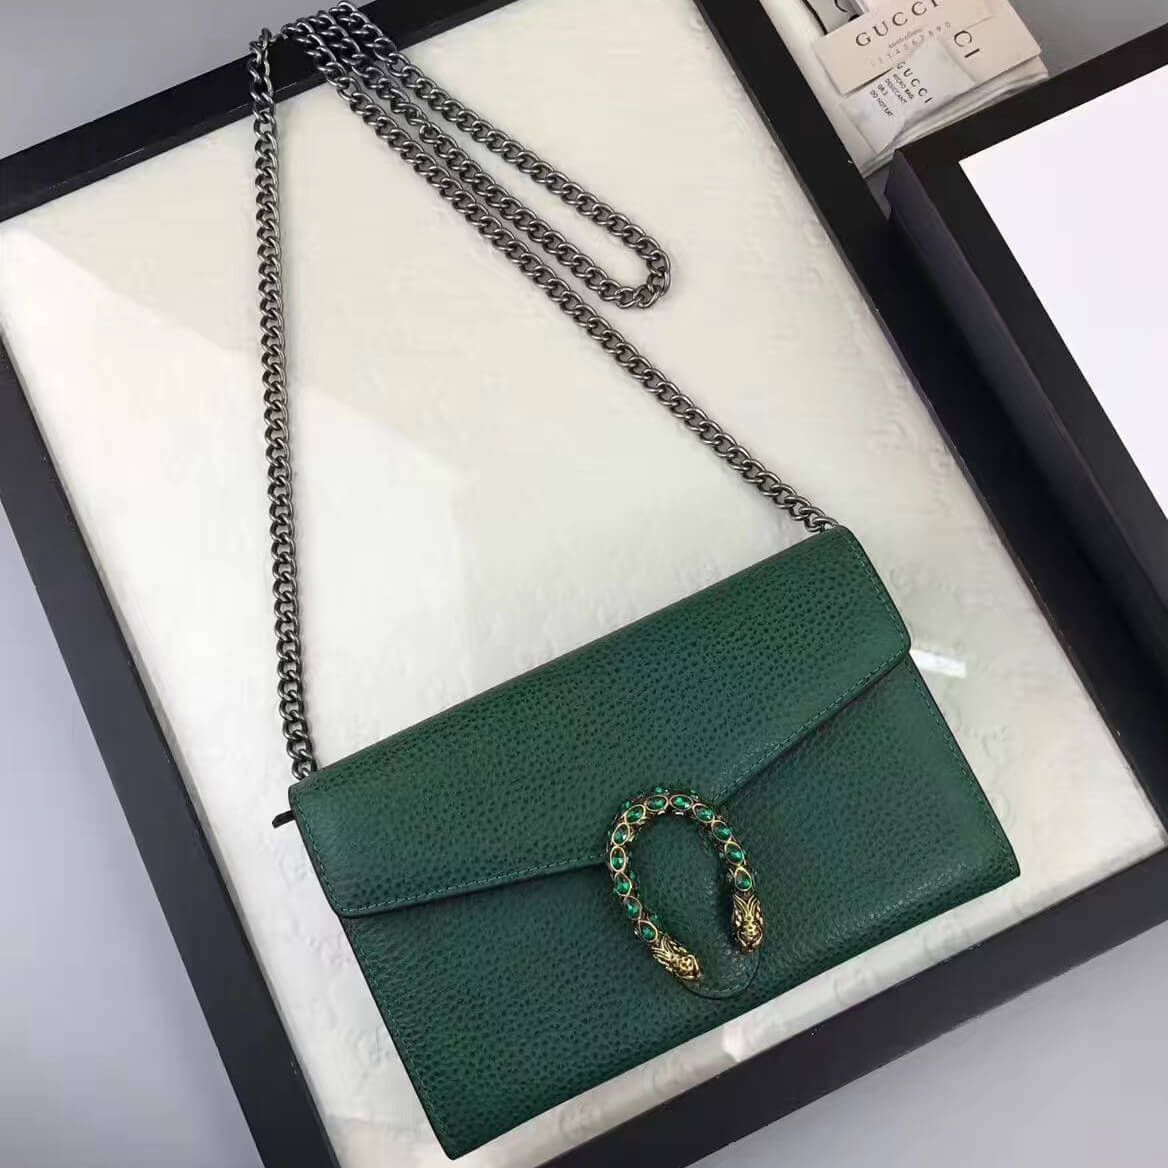 a41bde42fba Gucci Dionysus Leather Mini Chain Bag 401231 Green